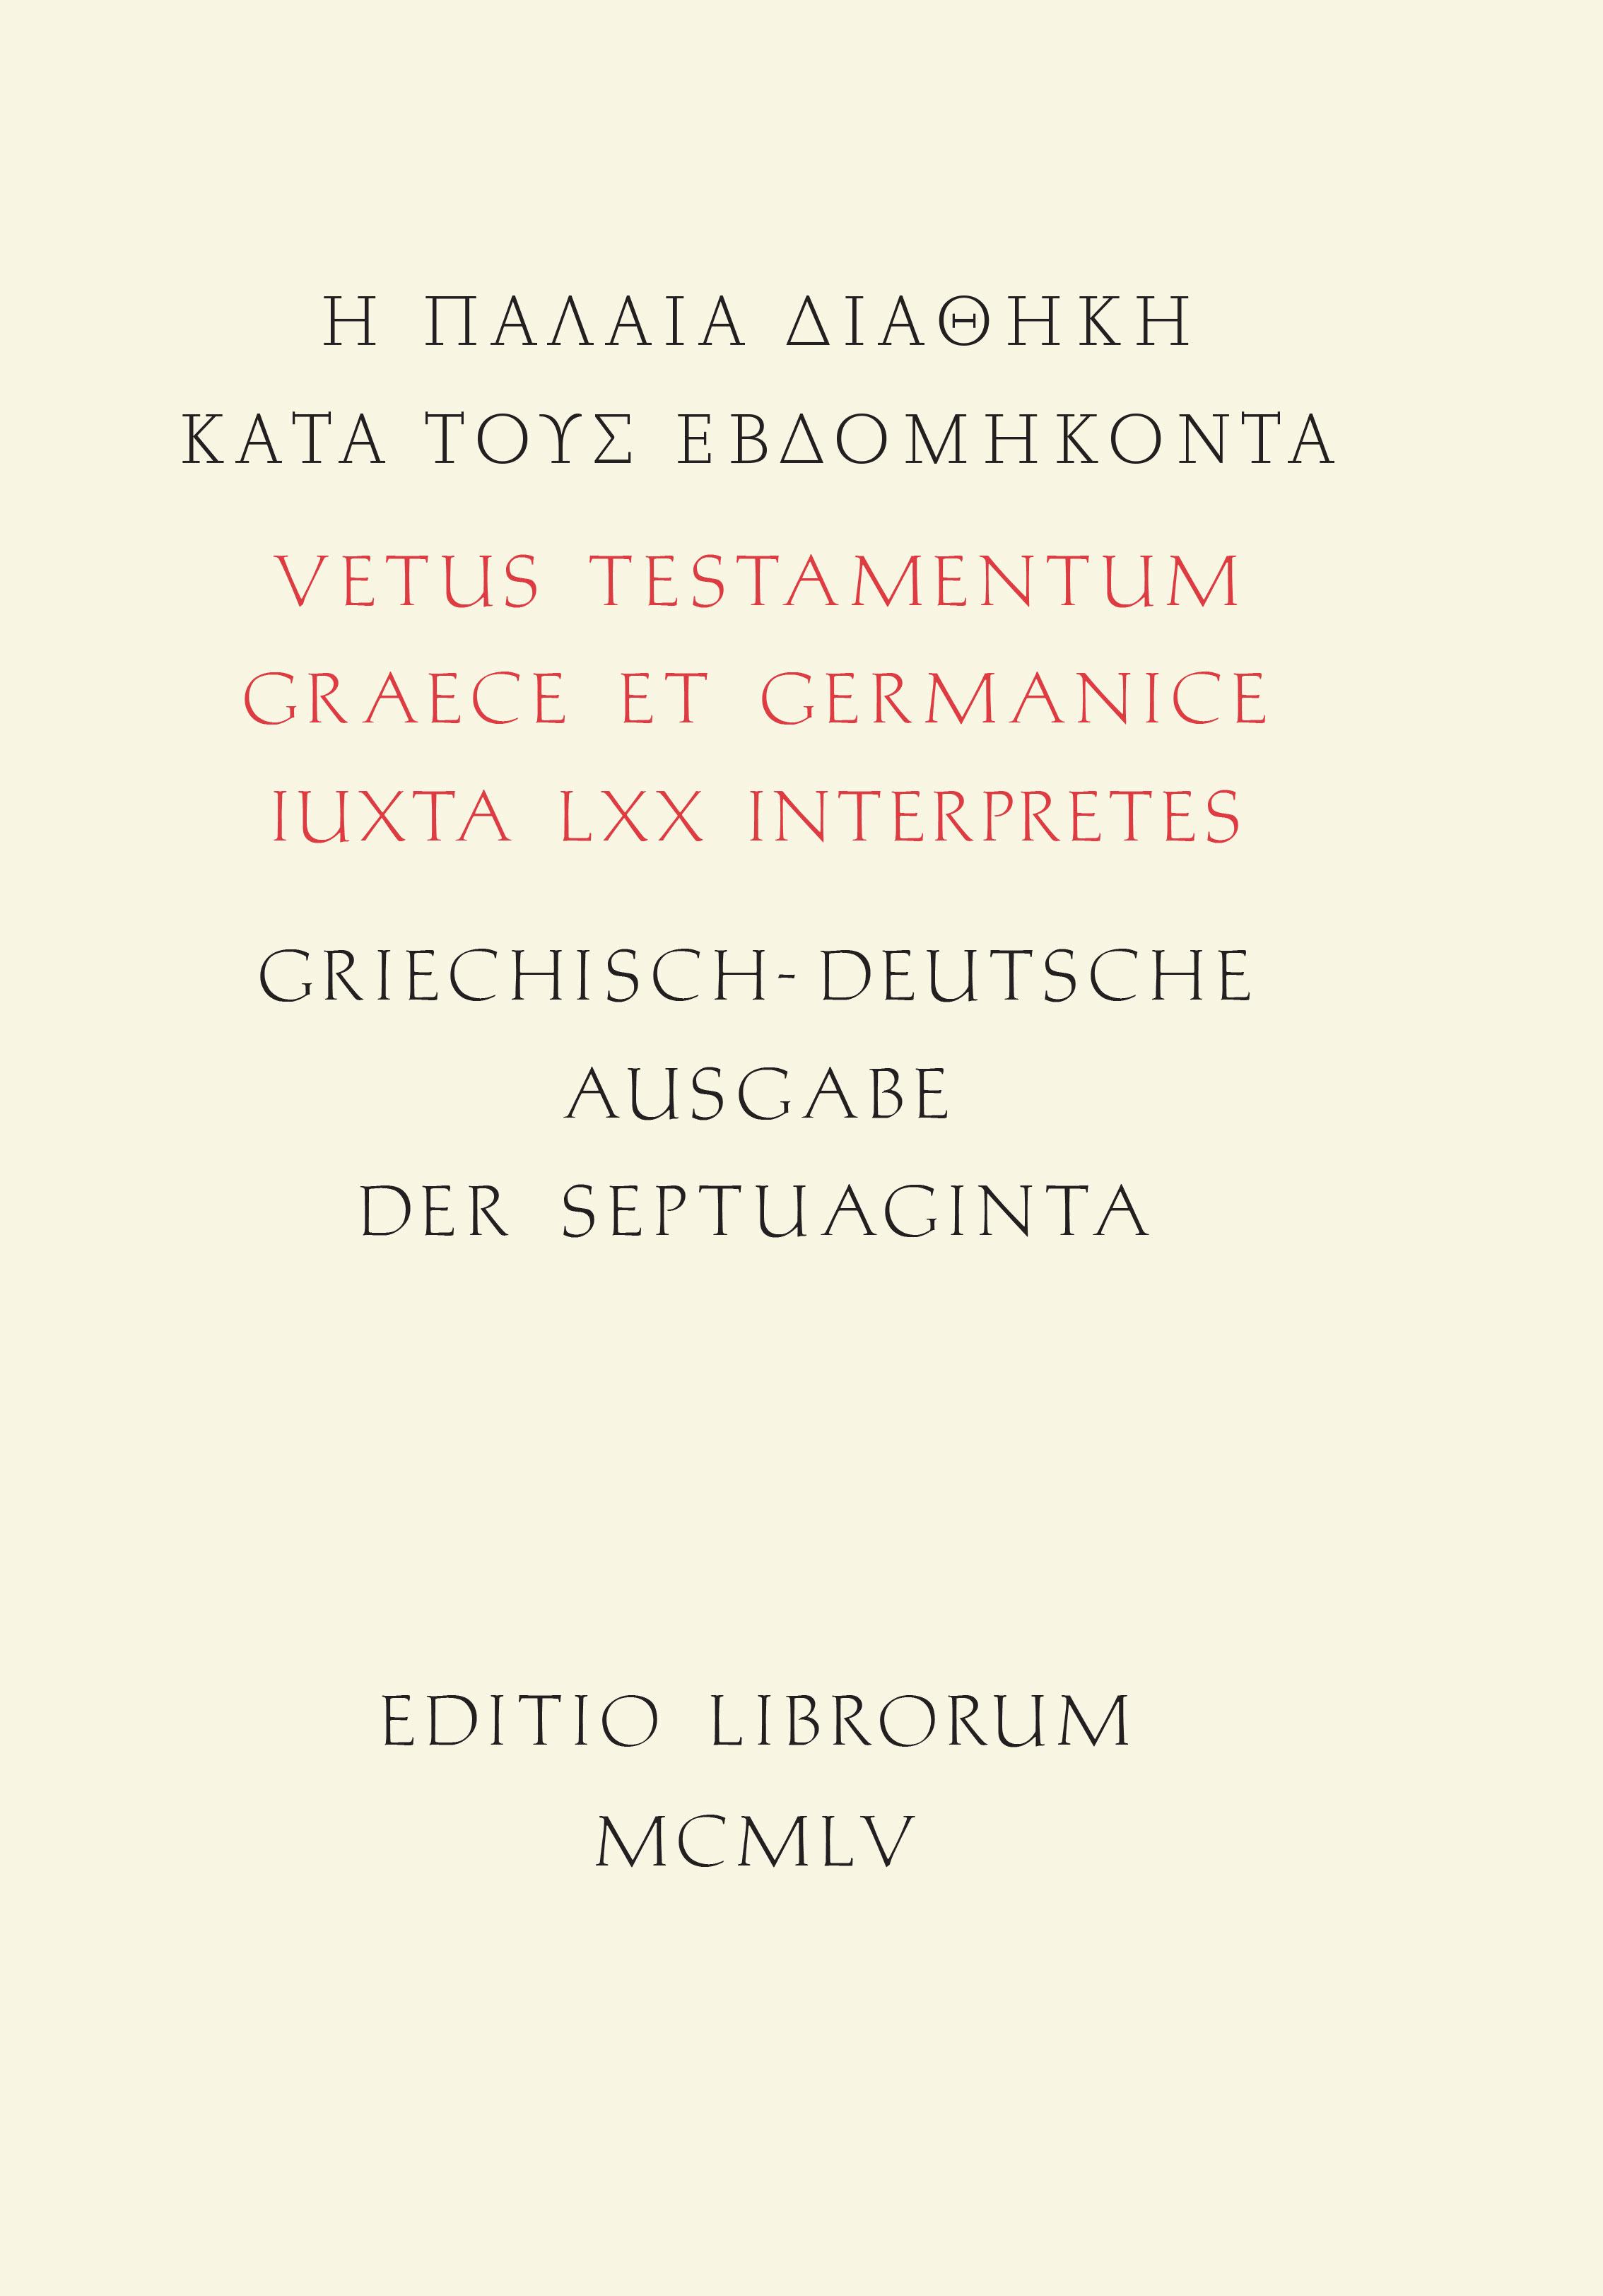 HERMANN ZAPF  Germany, 1955  Aldus, Palatino, Joanna Nova, Medici  19.2 X 27.5 cm  Letterpress  Liber Librorum Collection